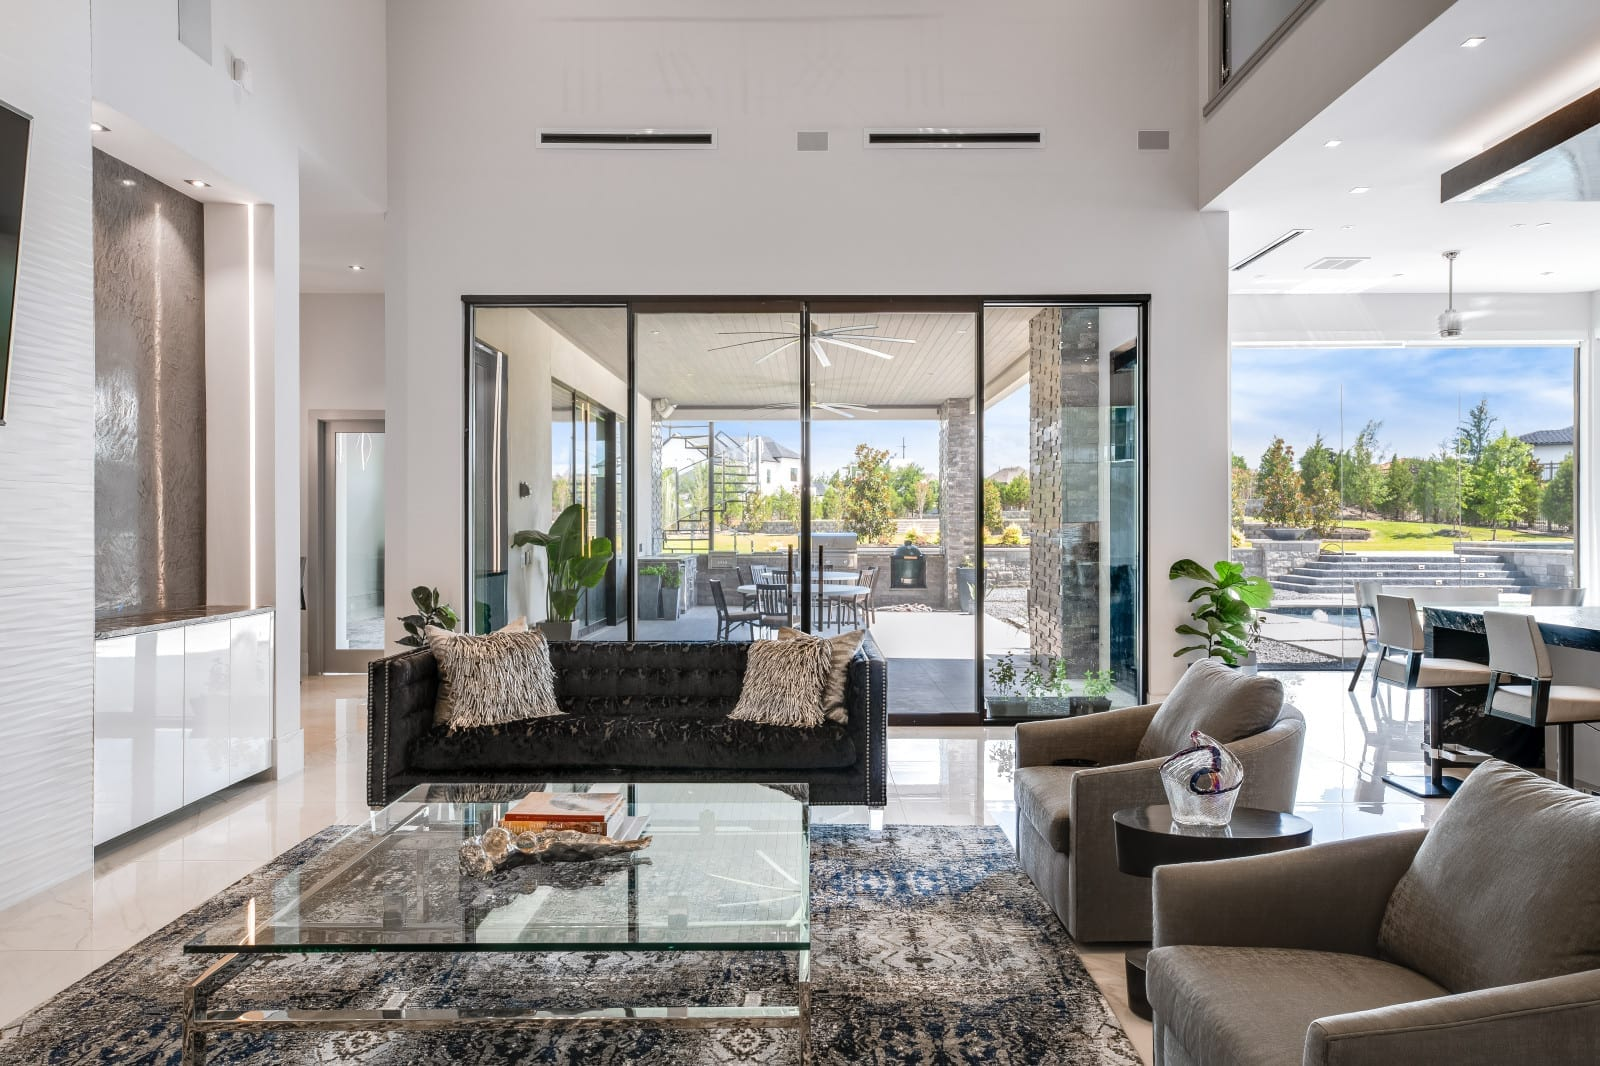 Custom Home Build and Interior Design # 8 - Millennial Design + Build, Custom Home Builders in Dallas Texas, modern style homes, Property Evaluator, Interior Designers, using BIM Technology and Home 3D Model.